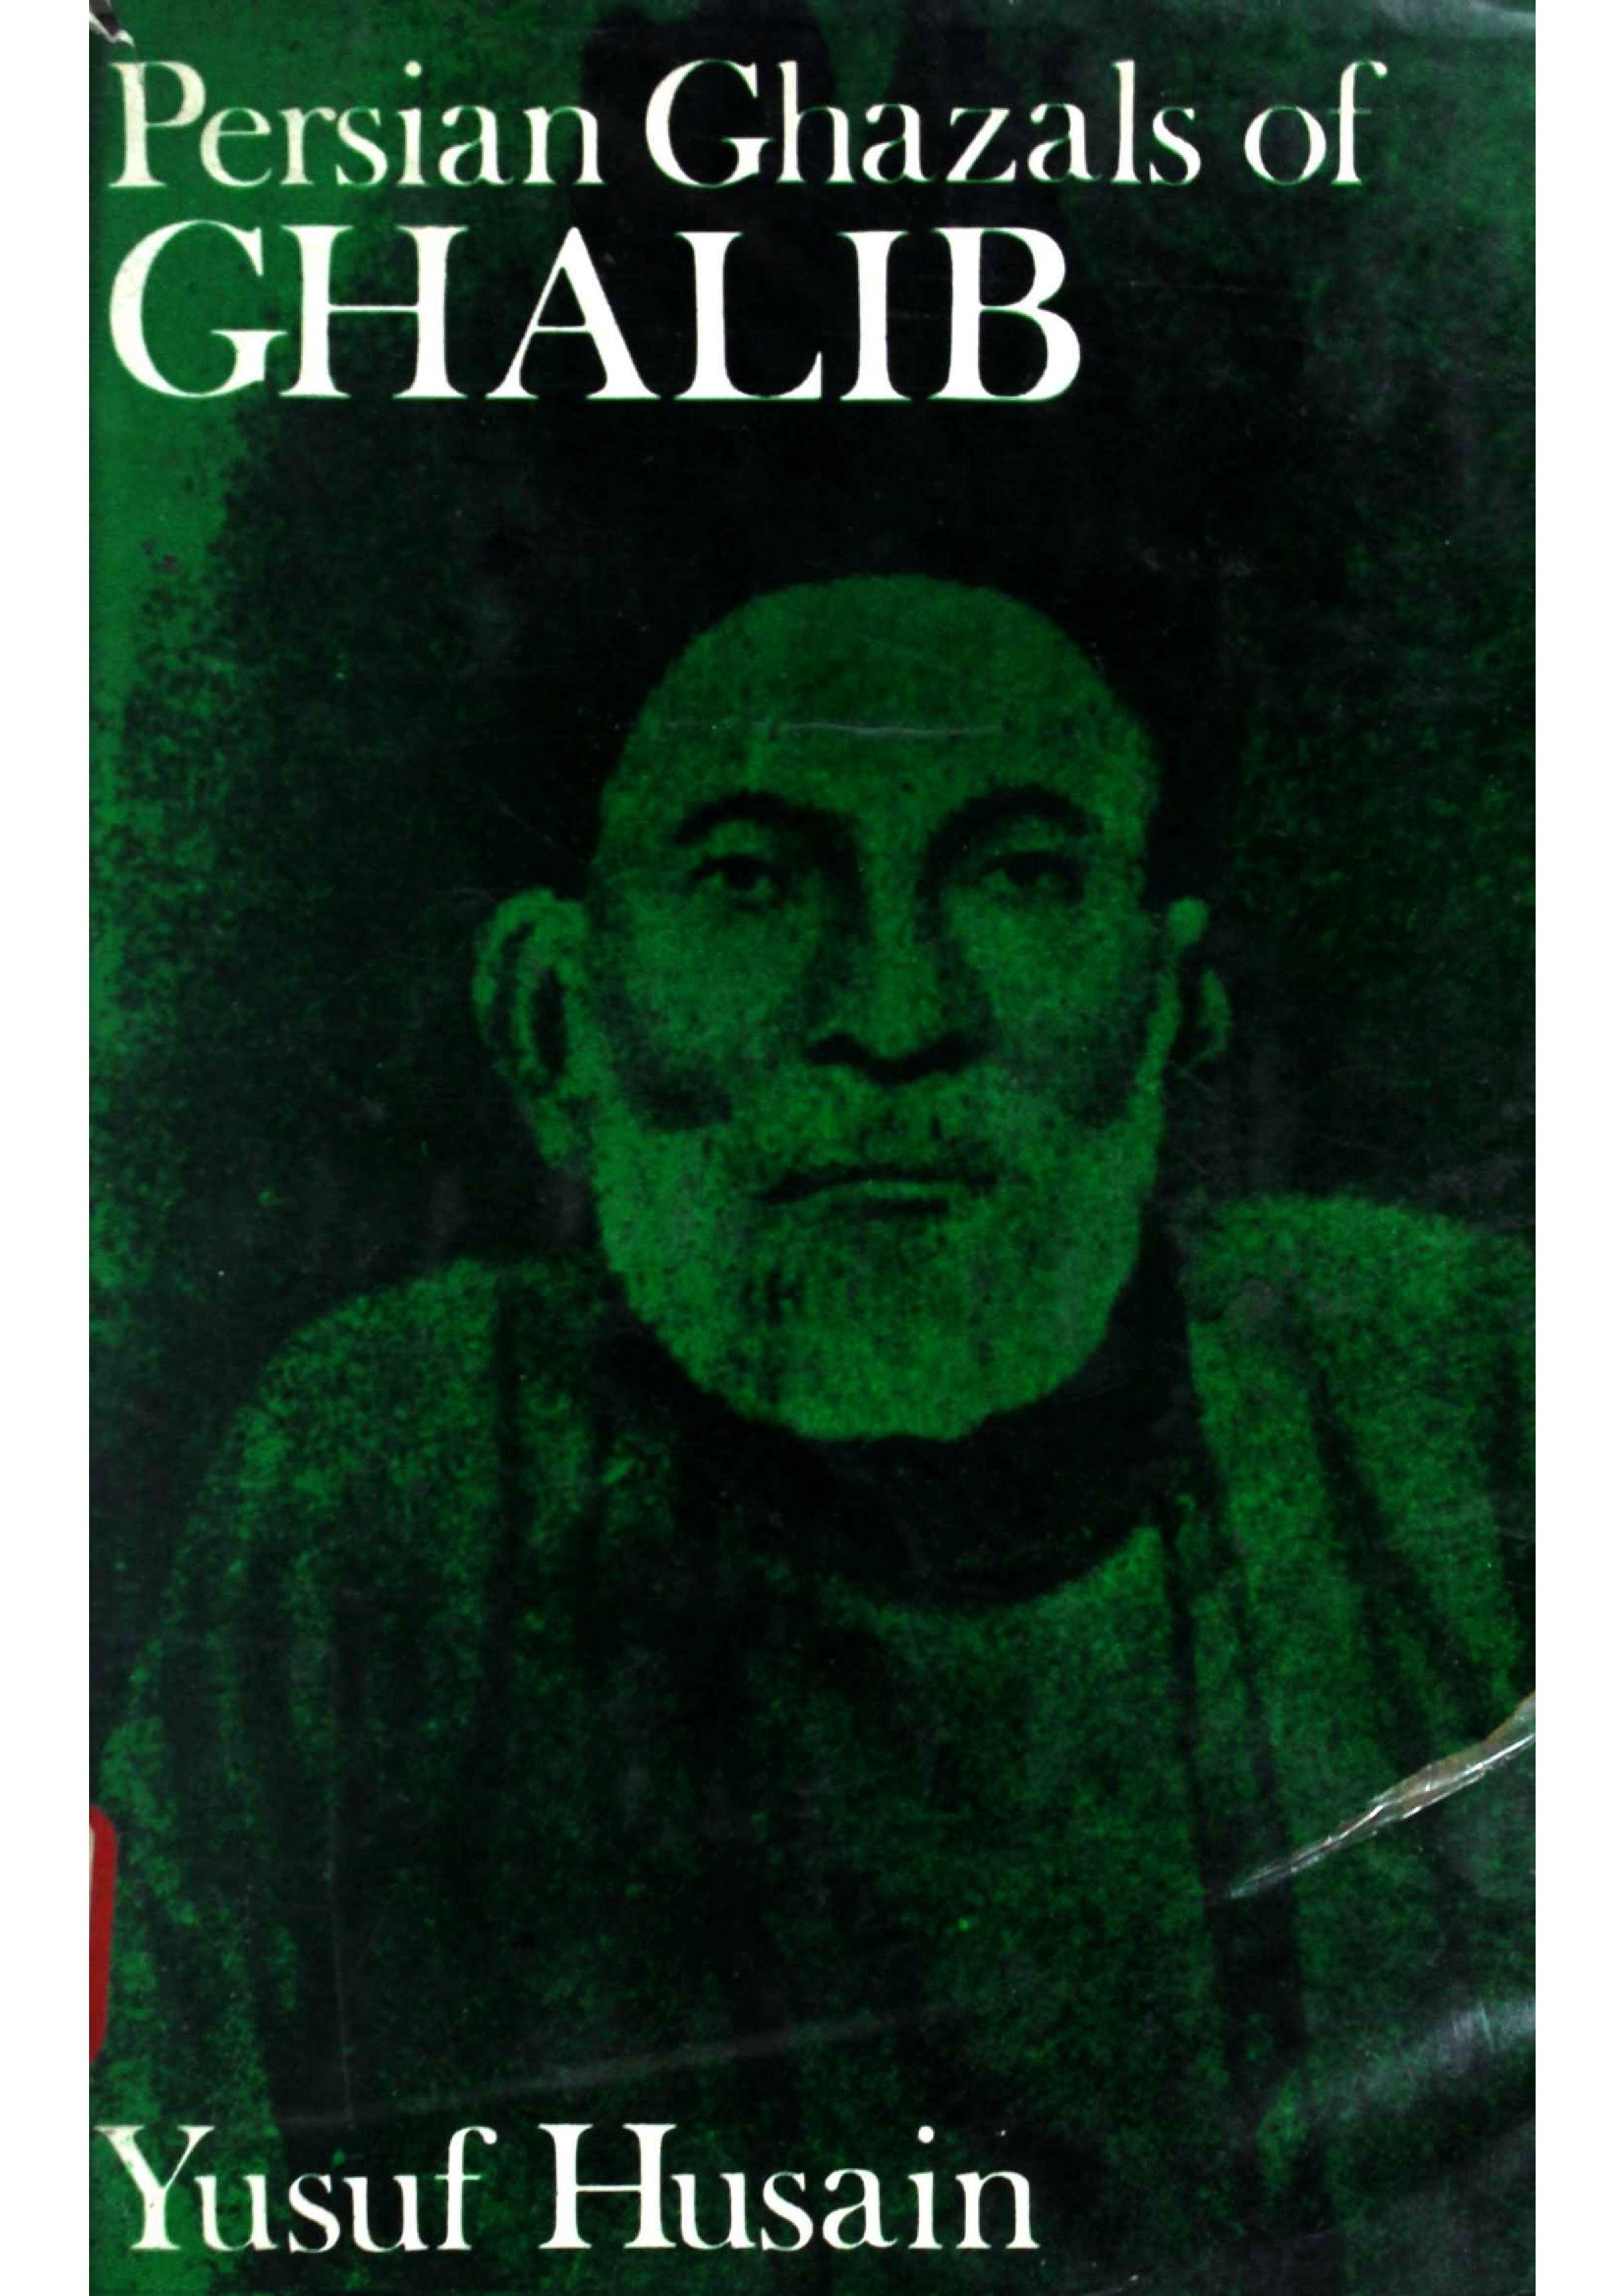 Persian Ghazals of Ghalib